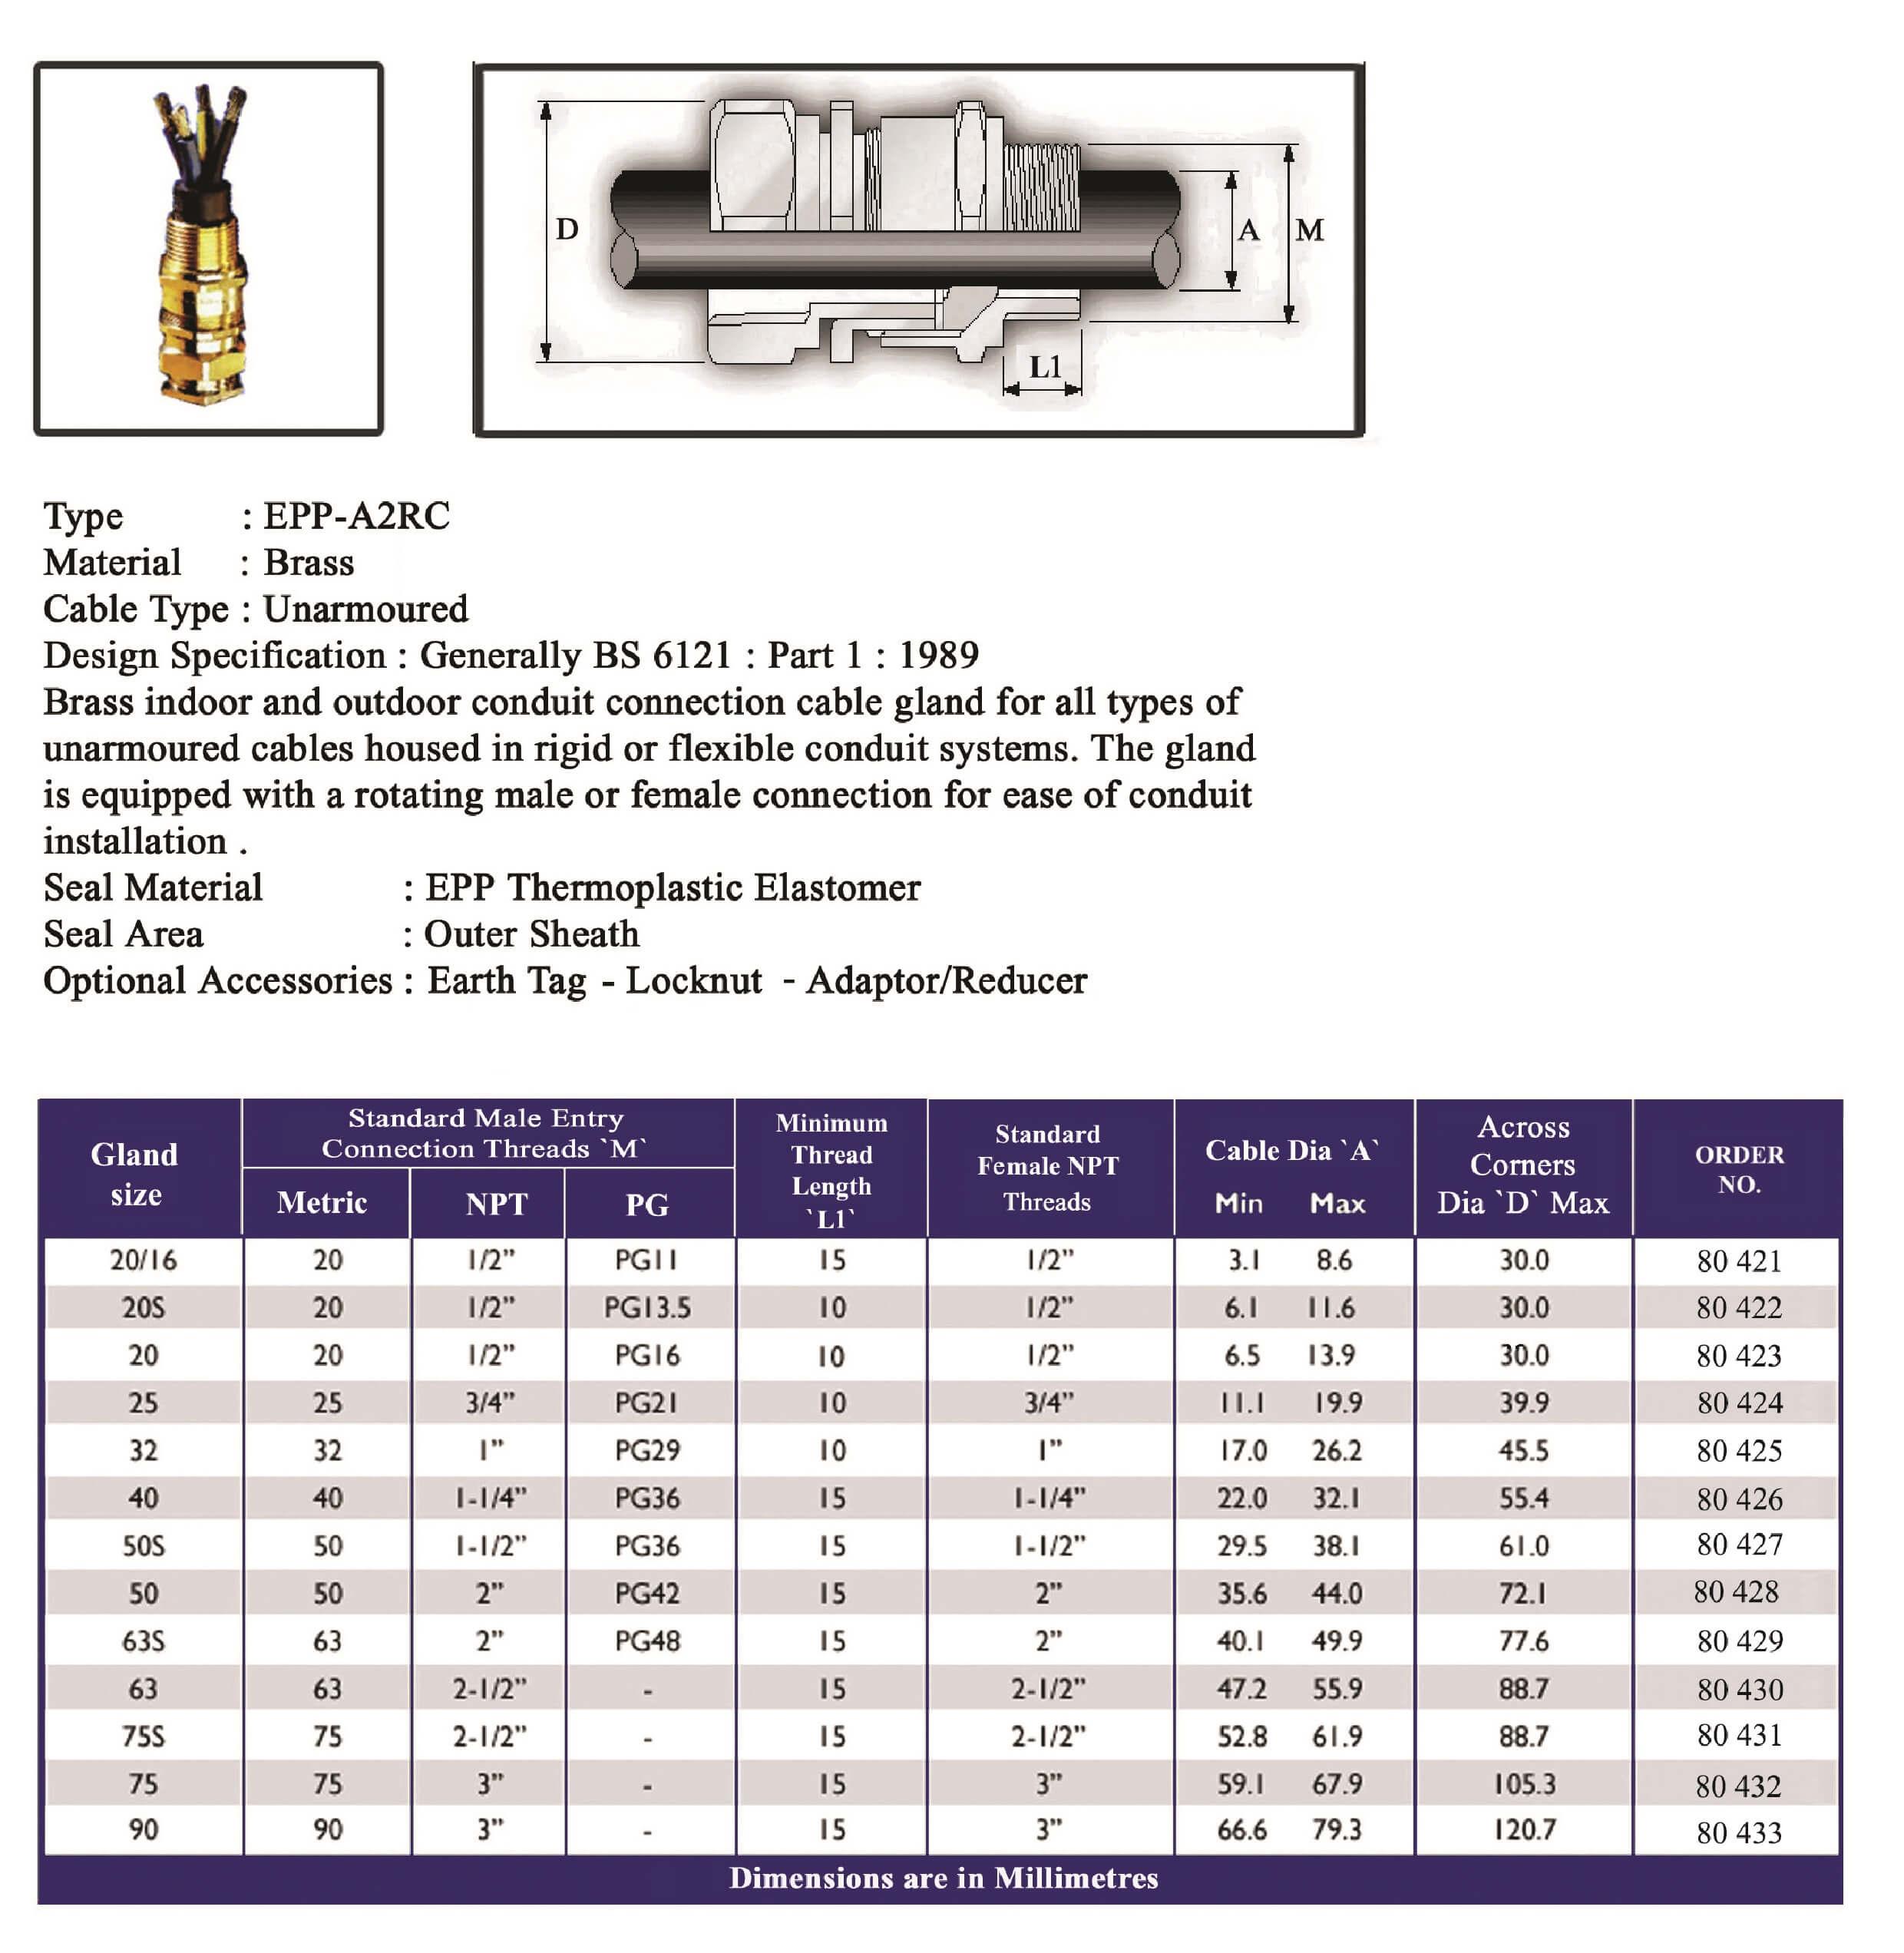 E.P.P - A2RC Technical Datasheet